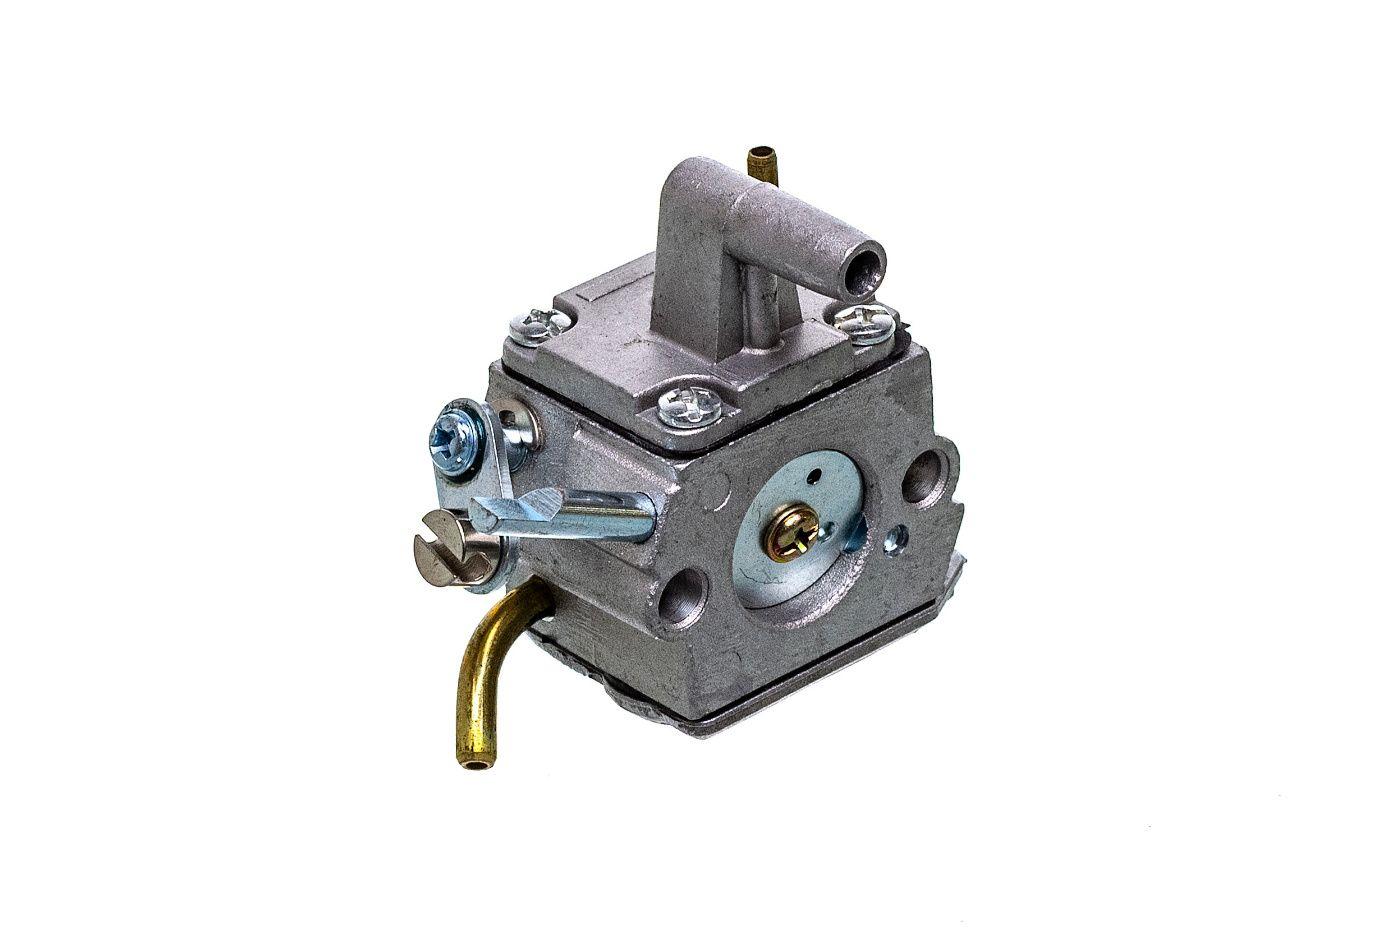 Karburátor Stihl FS400 FS450 FS480 FR350 STARÝ TYP - C1Q-S34H - 4128 120 0651 AKCE